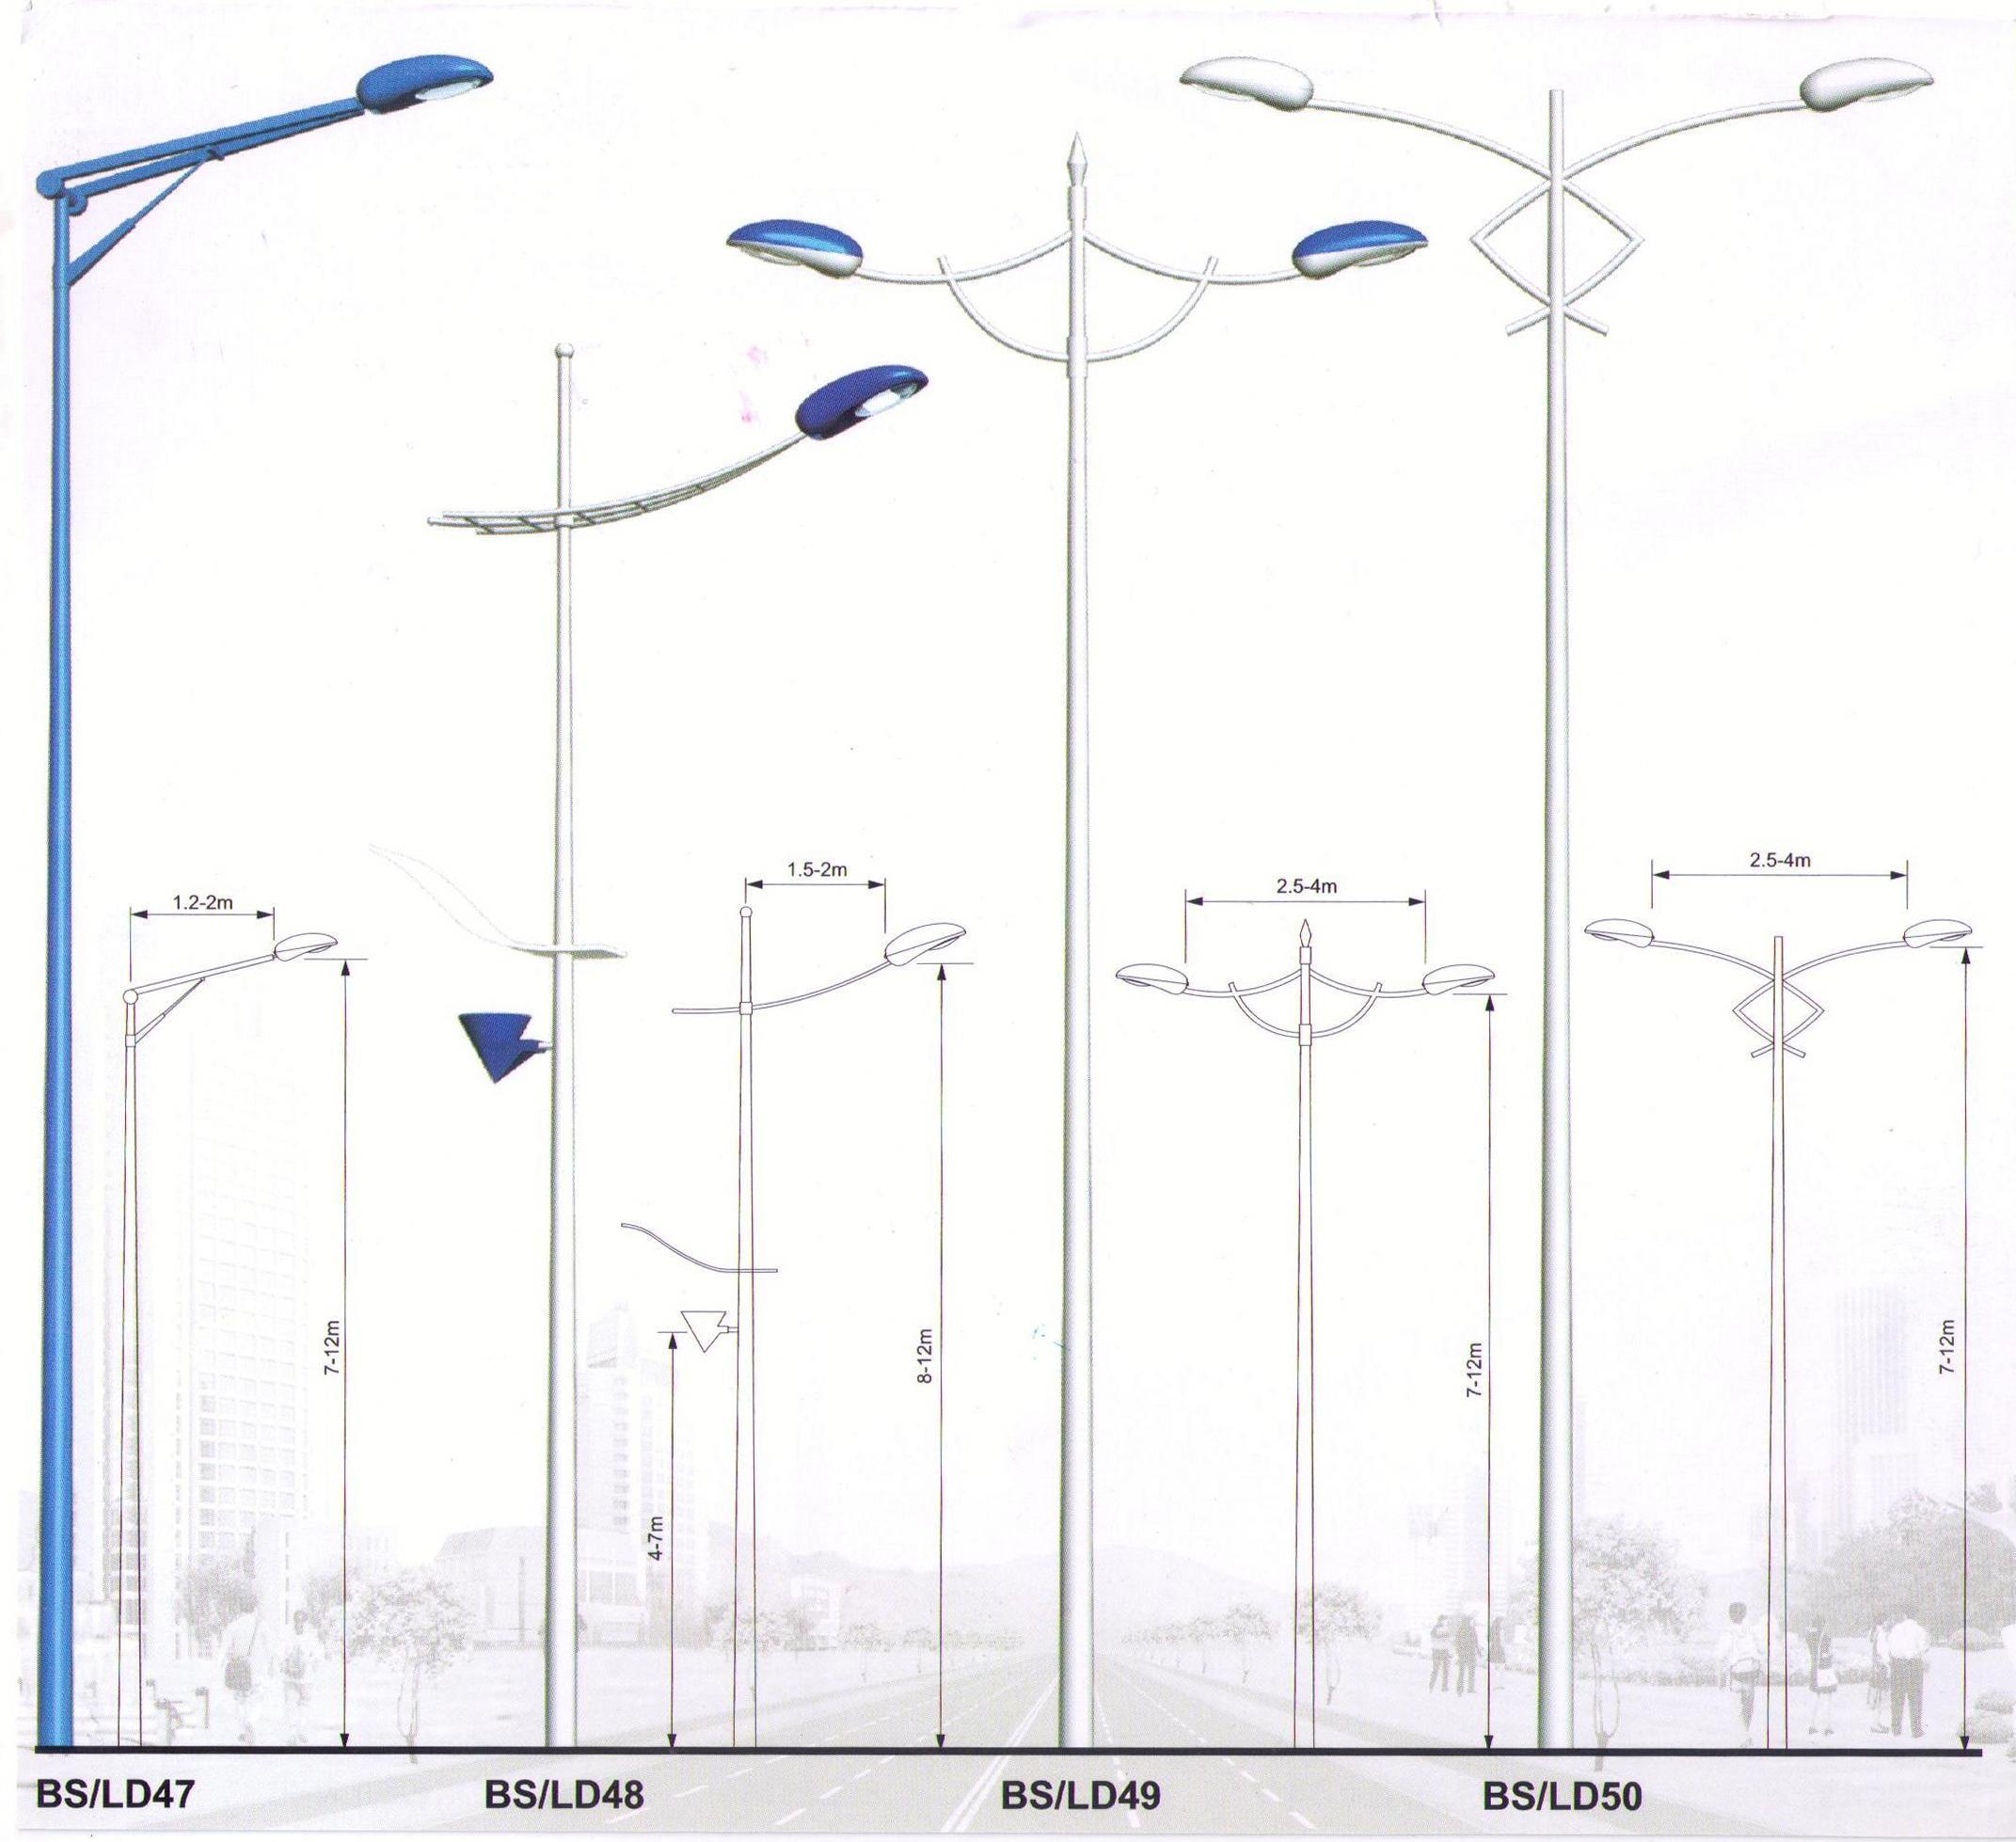 Street Light Poles Manufacturer and Dealer | Bangalore